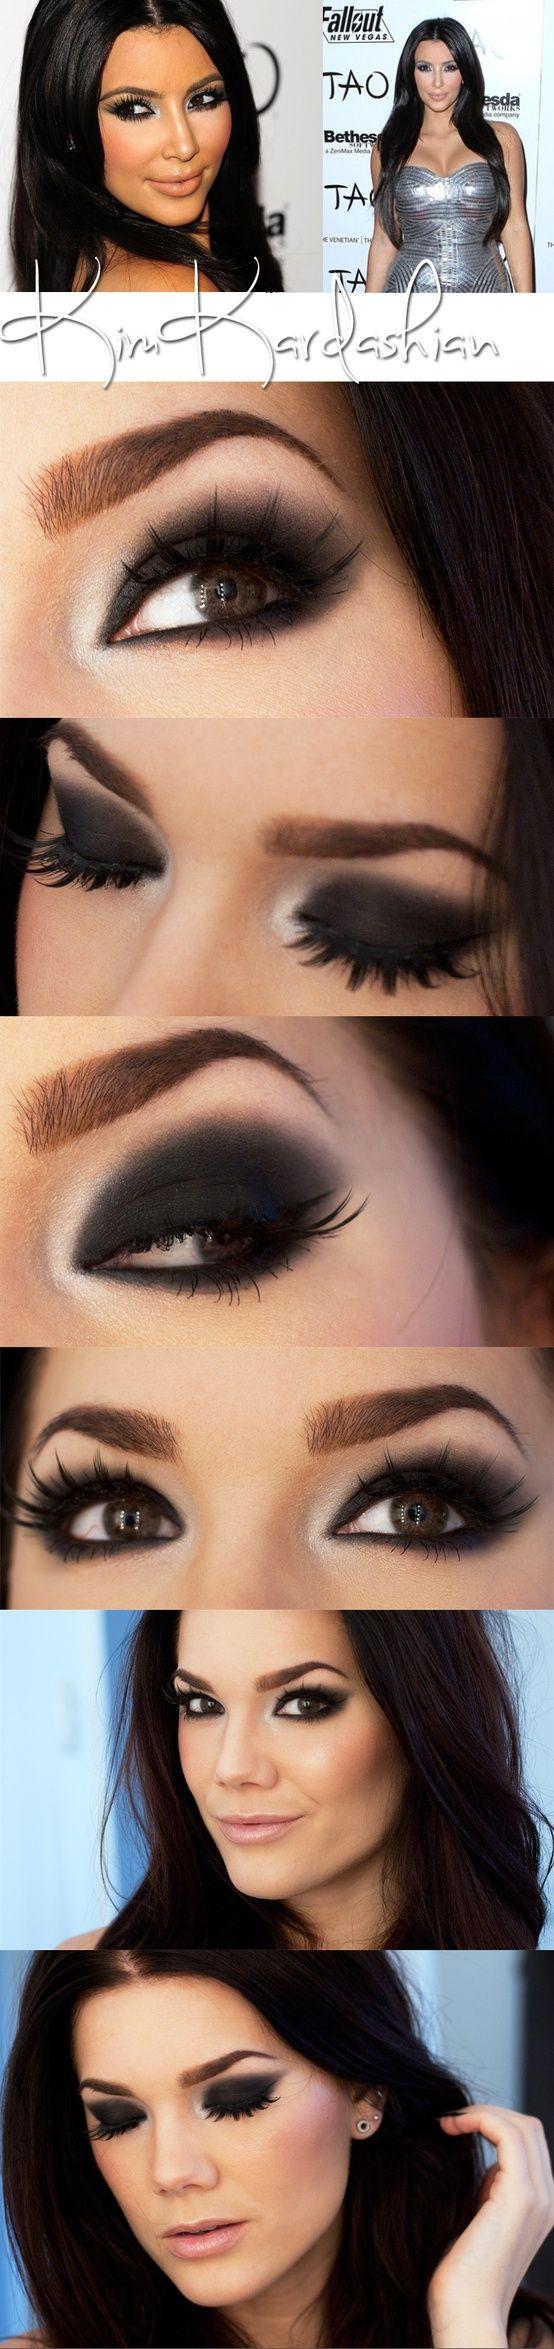 Today's look inspired by Kim Kardashian ~ Linda Hallberg, makeup artist